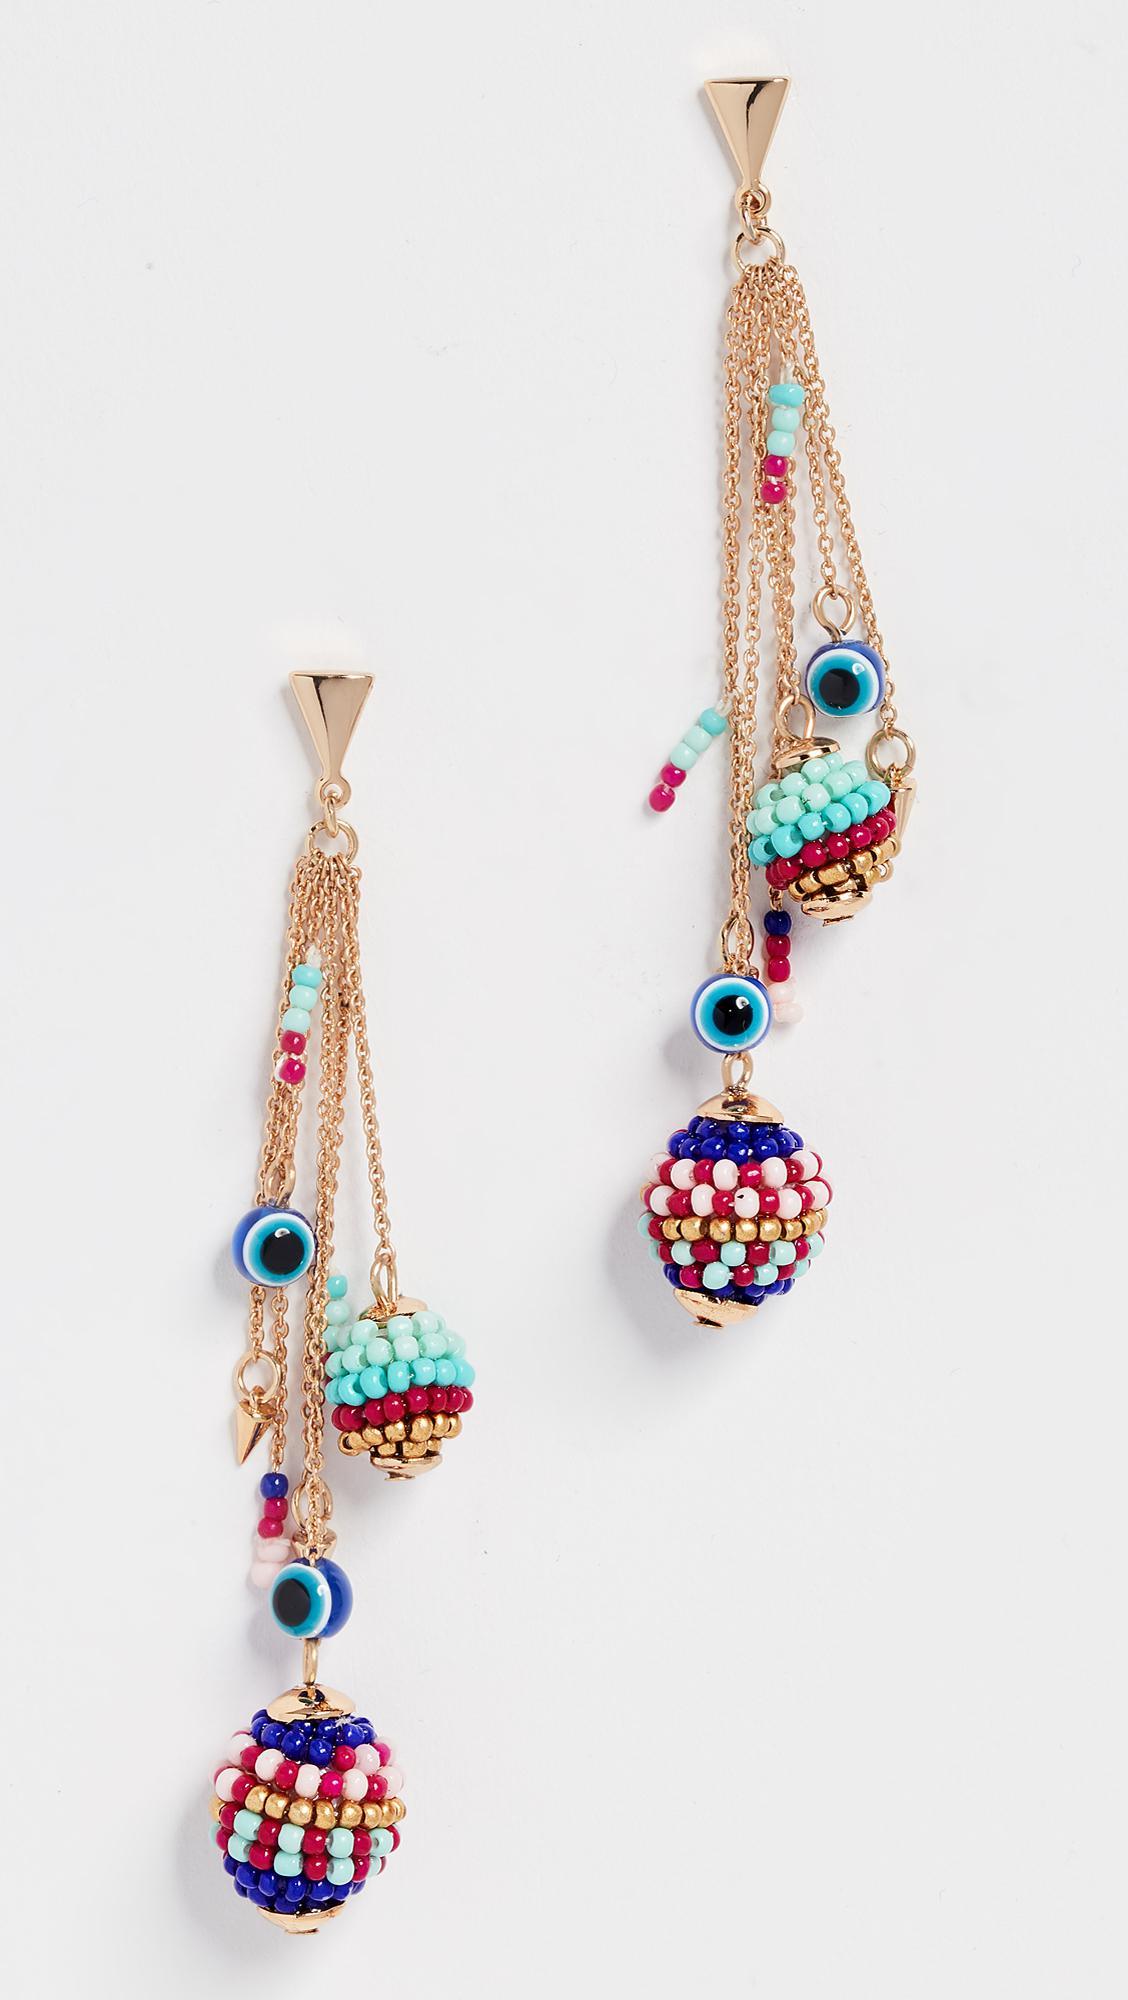 Blair Beaded Ball Earrings in Metallic Gold Rebecca Minkoff Bc4PtEWI